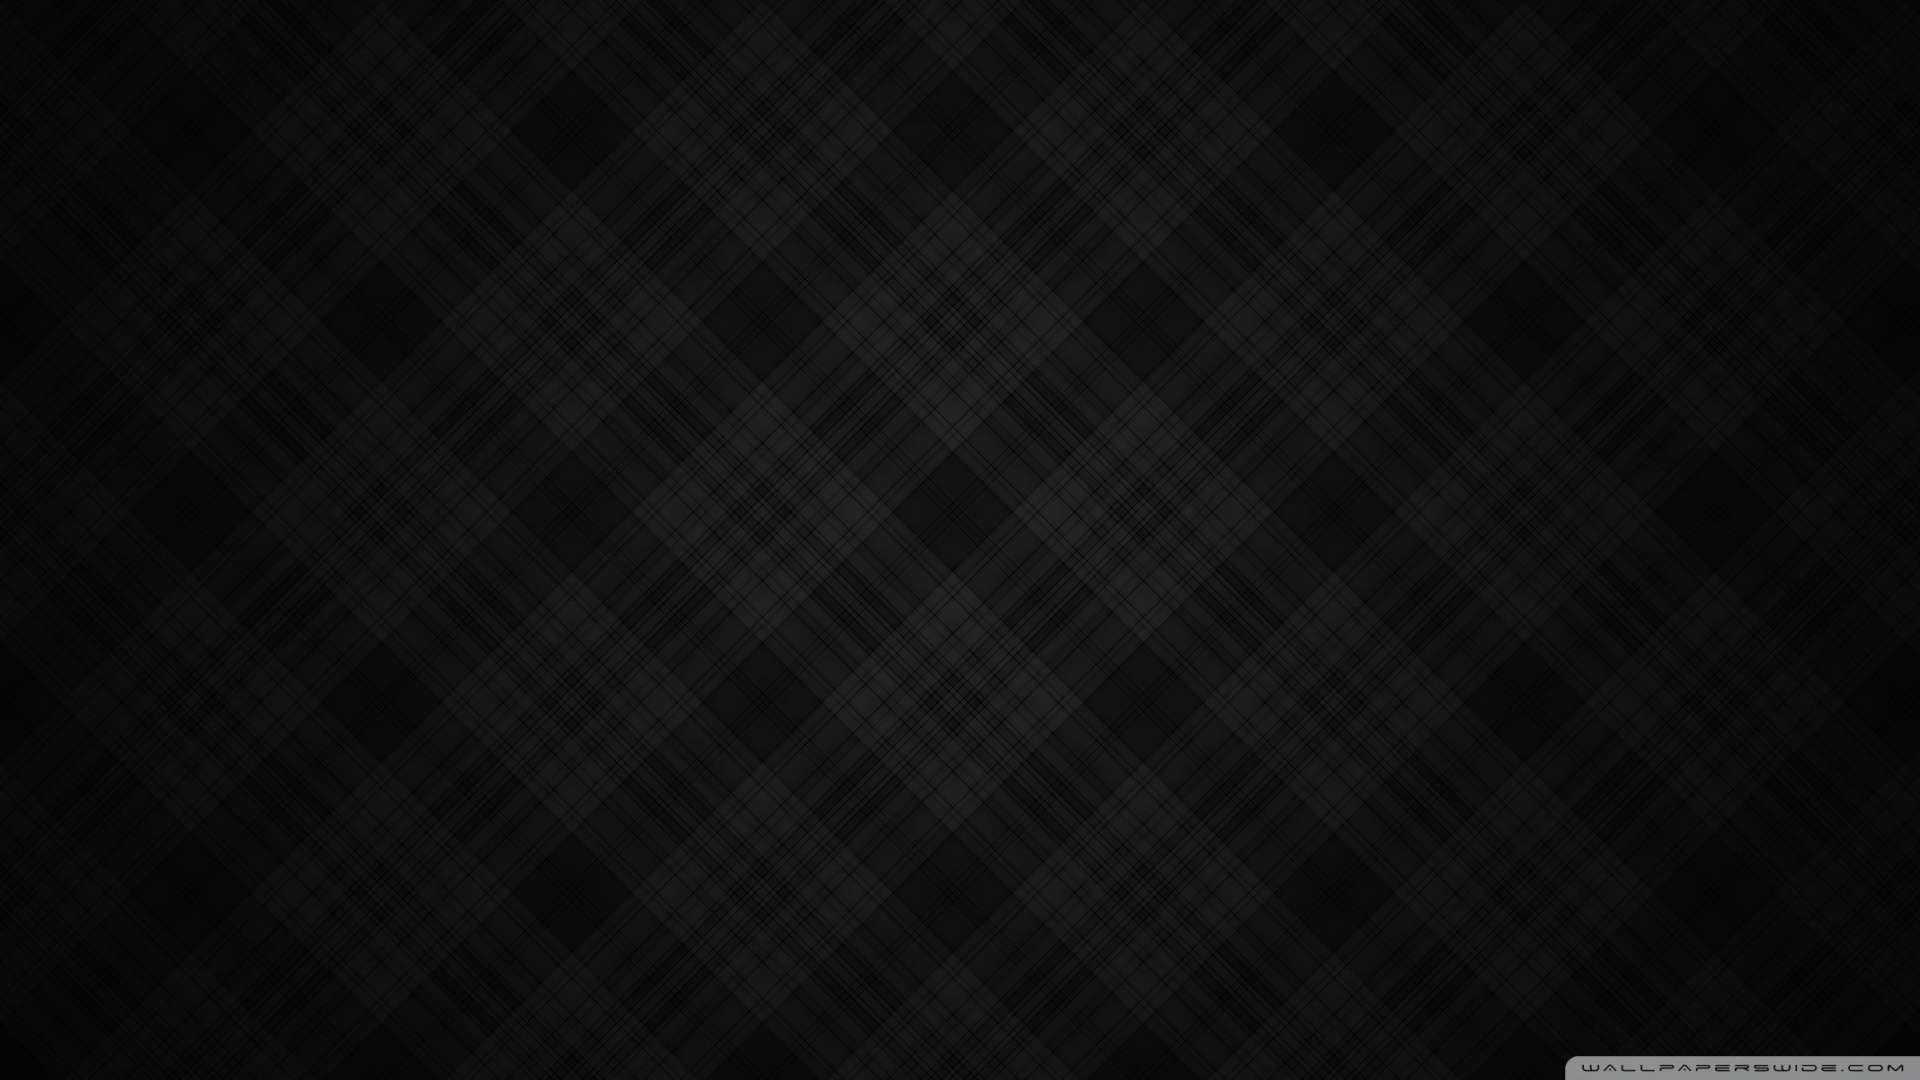 Wallpaper Black Texture Wallpaper 1080p HD Upload at February 12 1920x1080